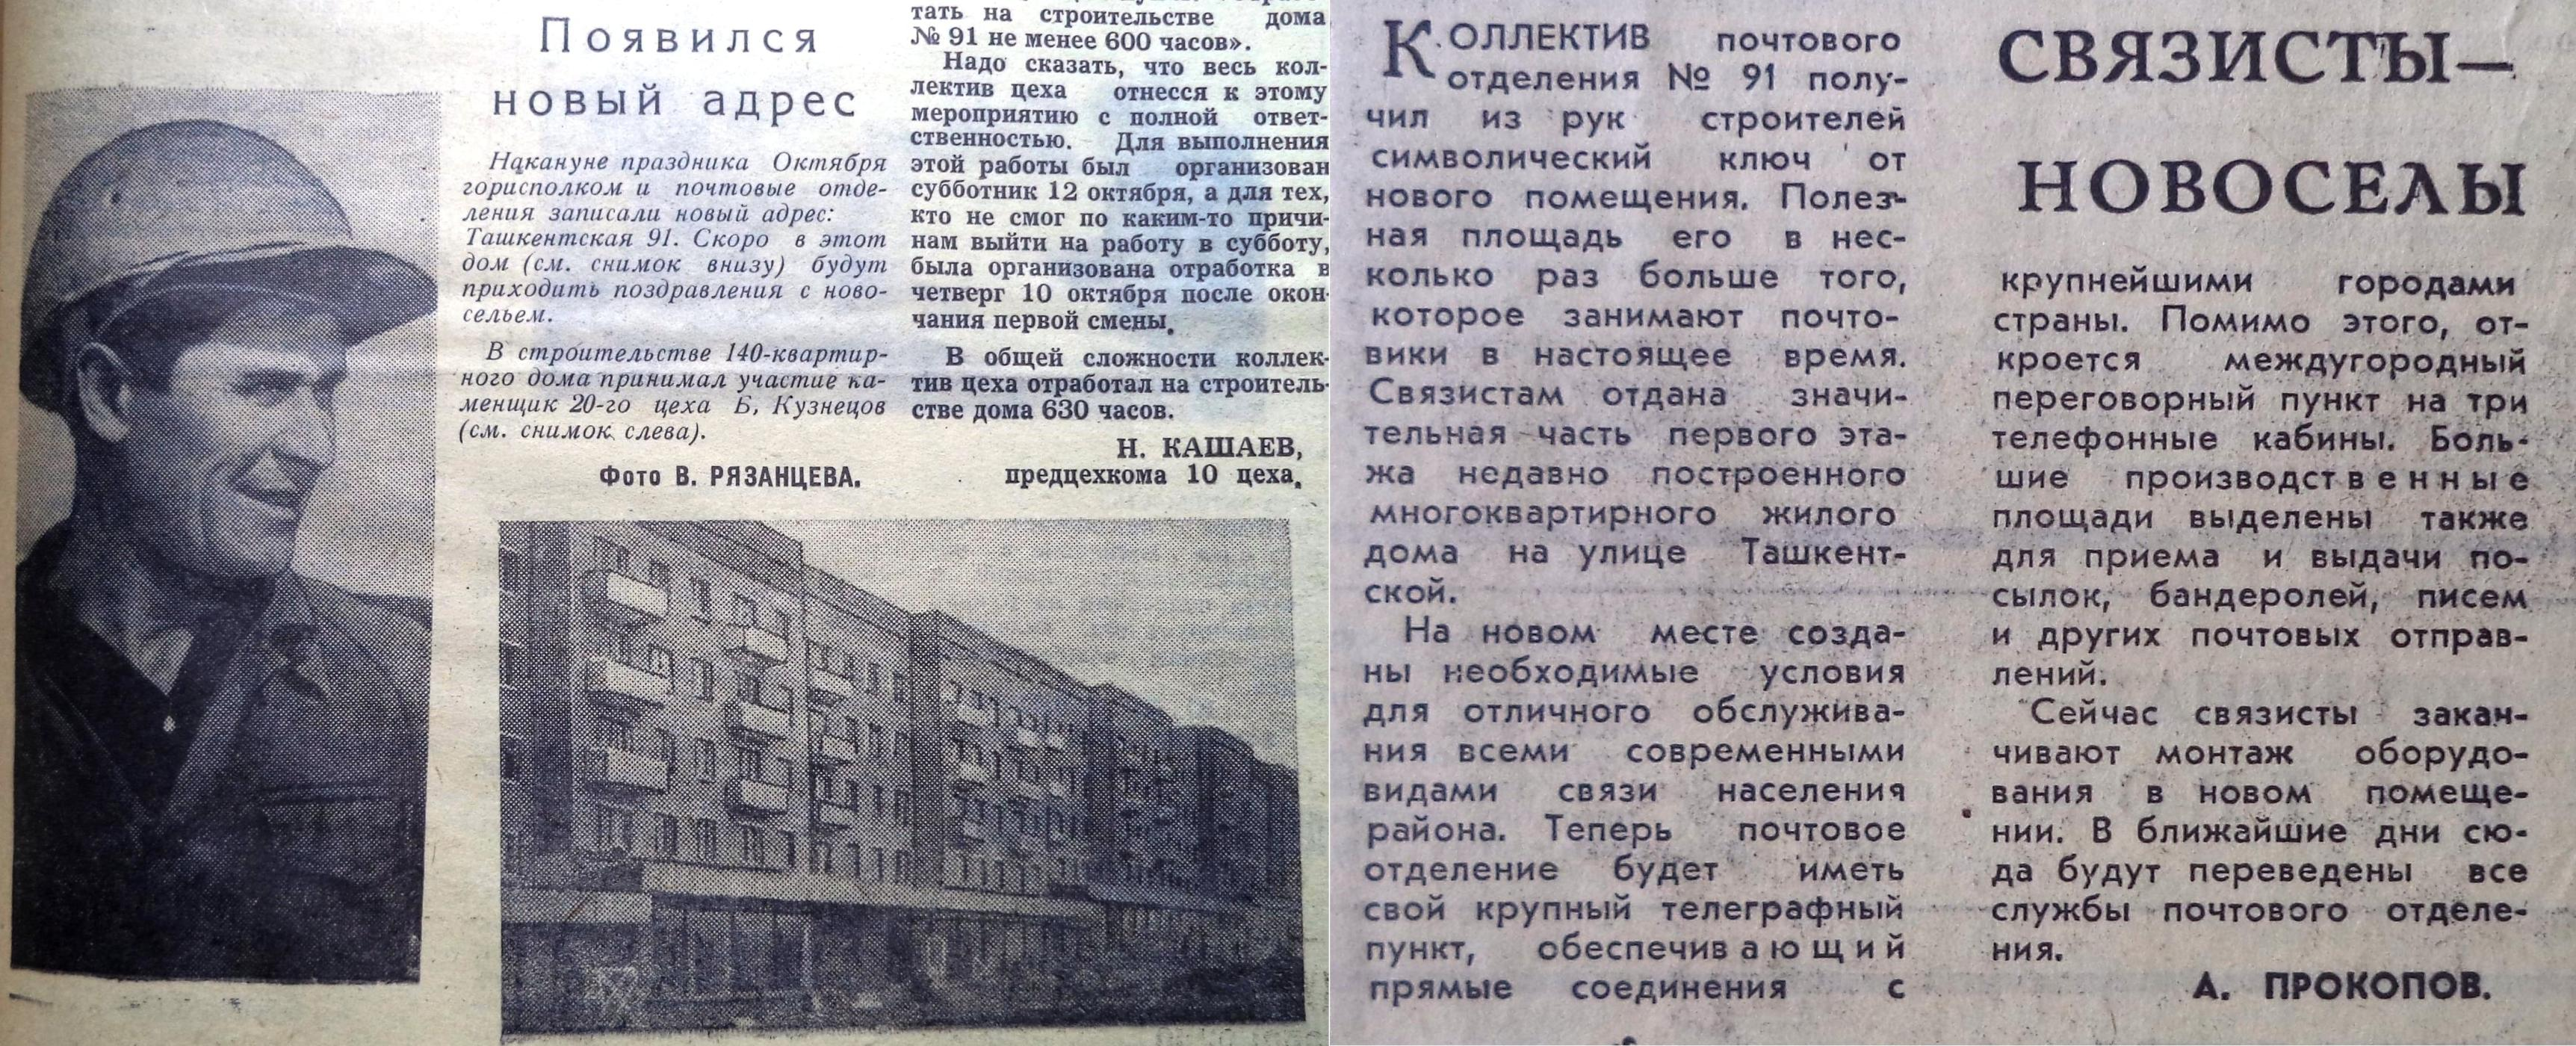 Ташкентская-ФОТО-31-Новатор-1974-13 ноября-min-min